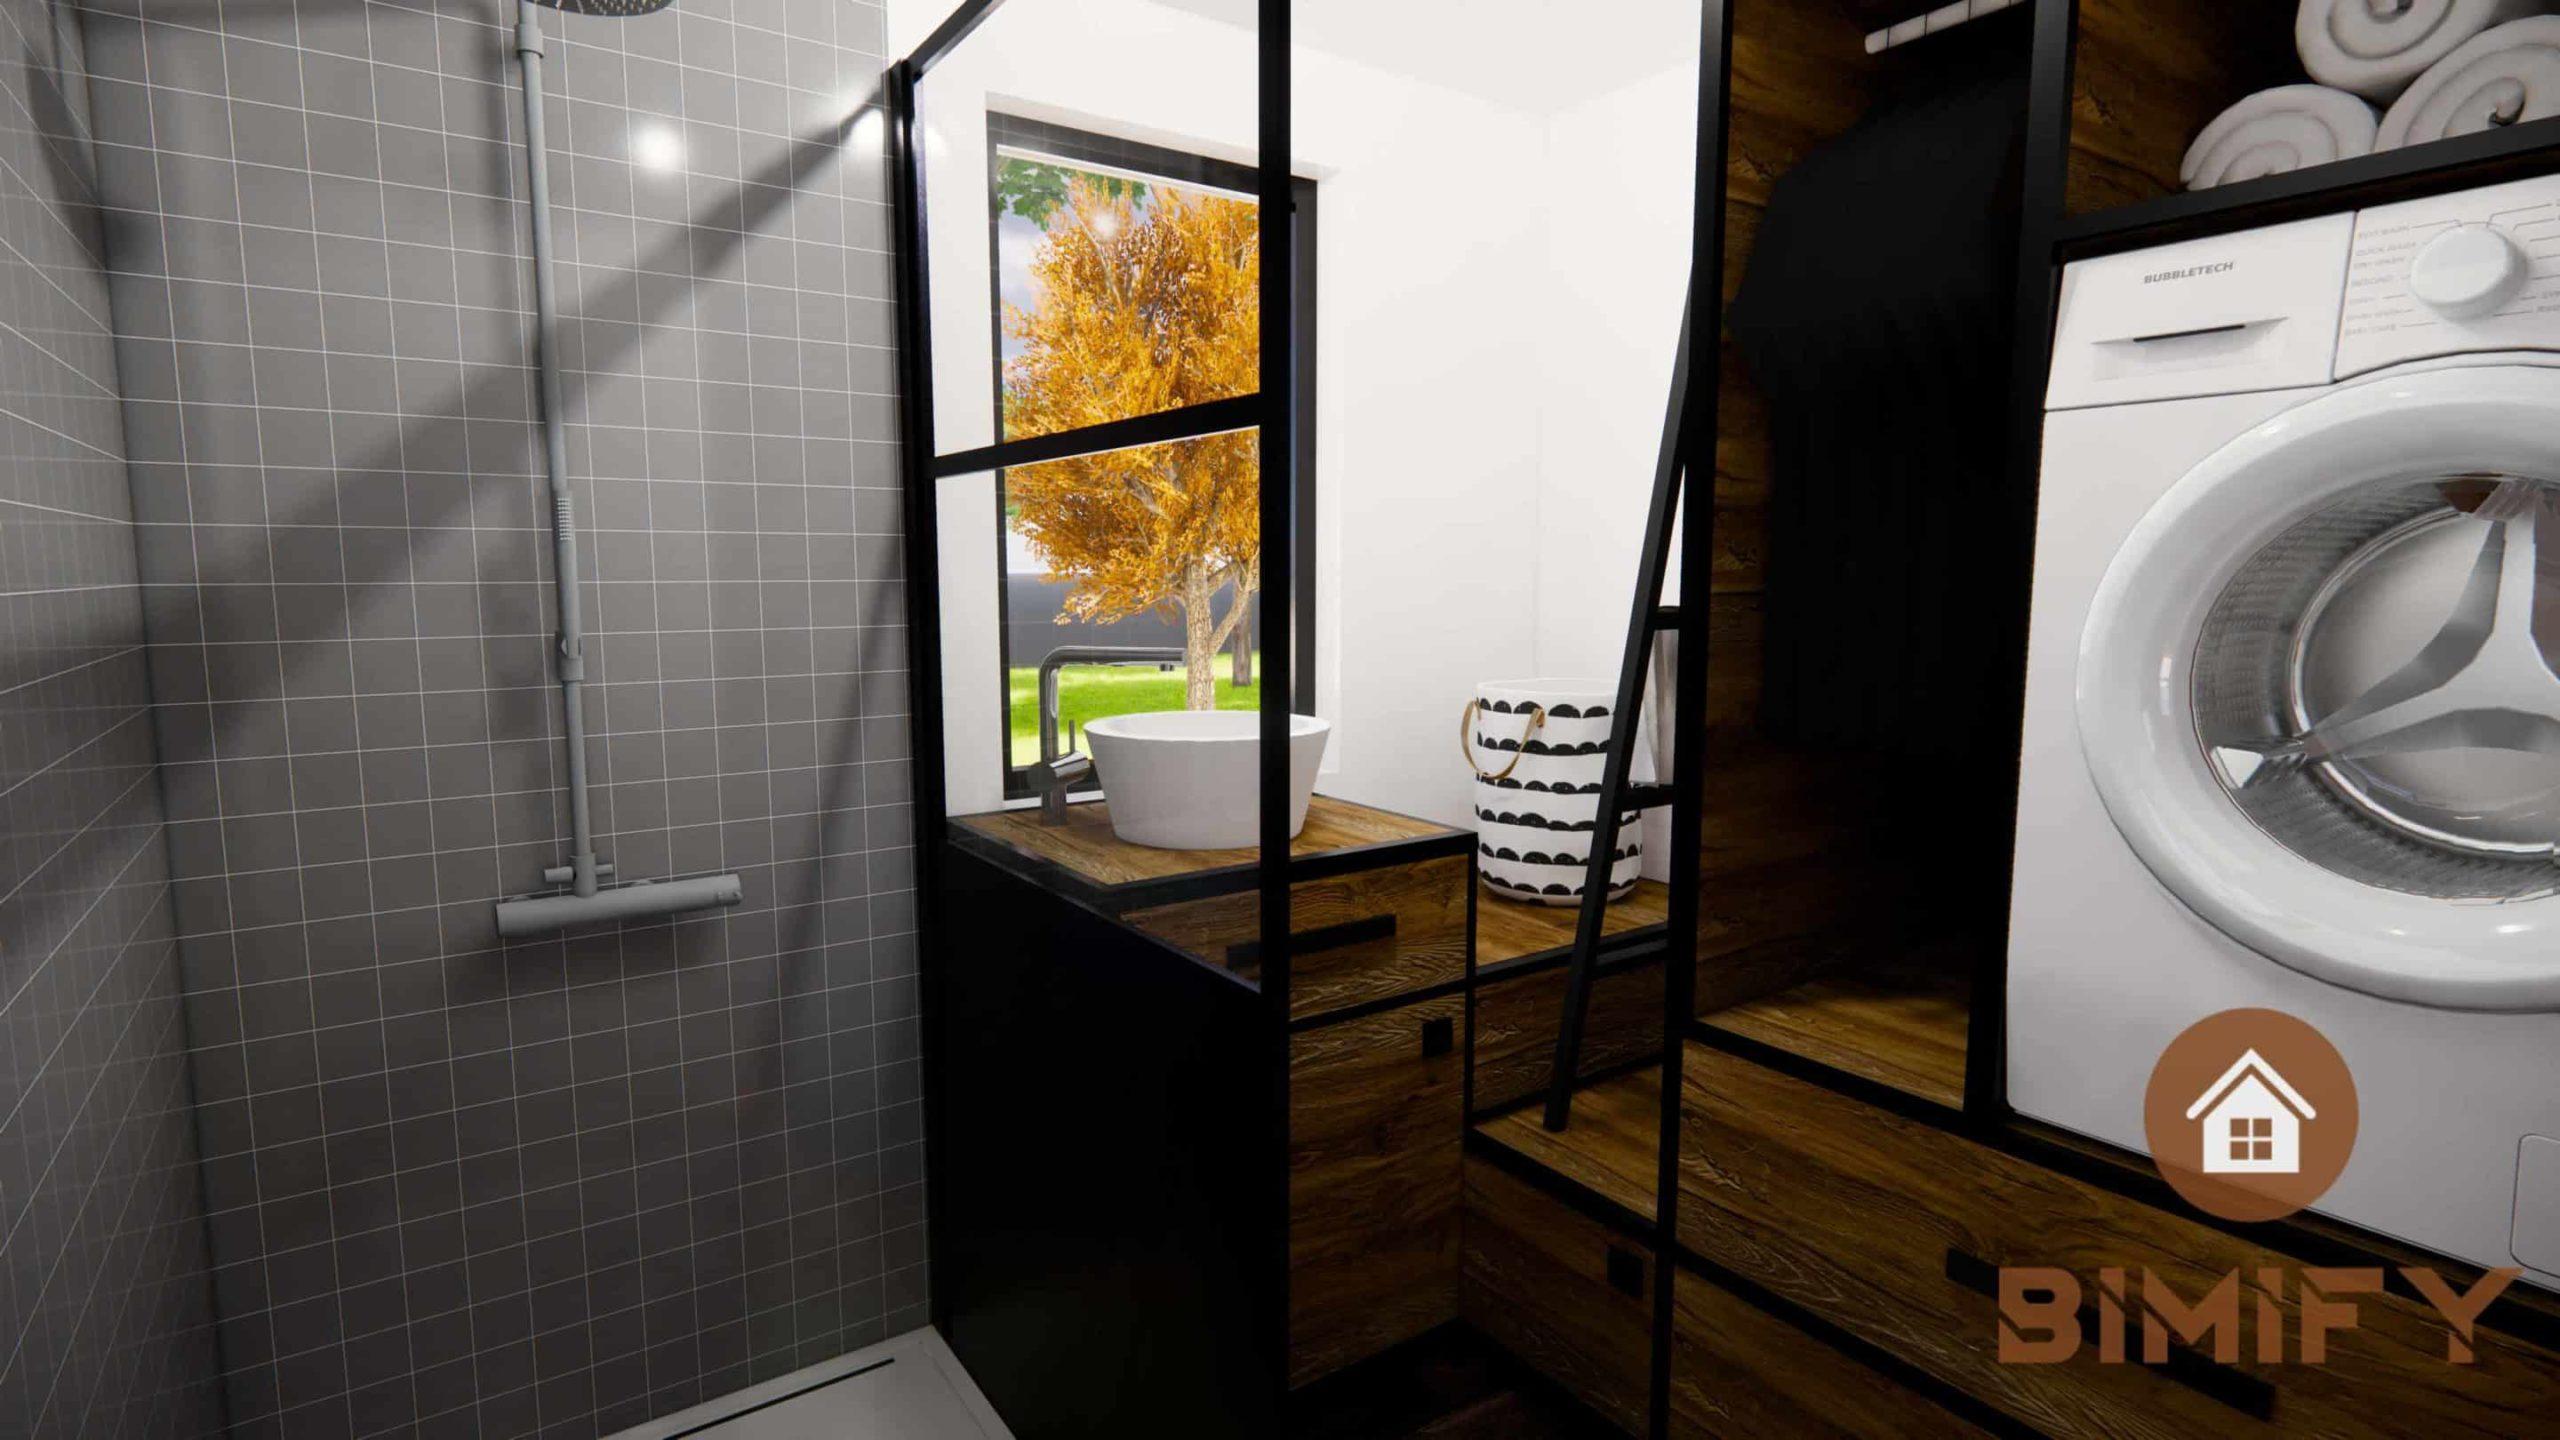 Raccordi per il bagno di una minuscola casa